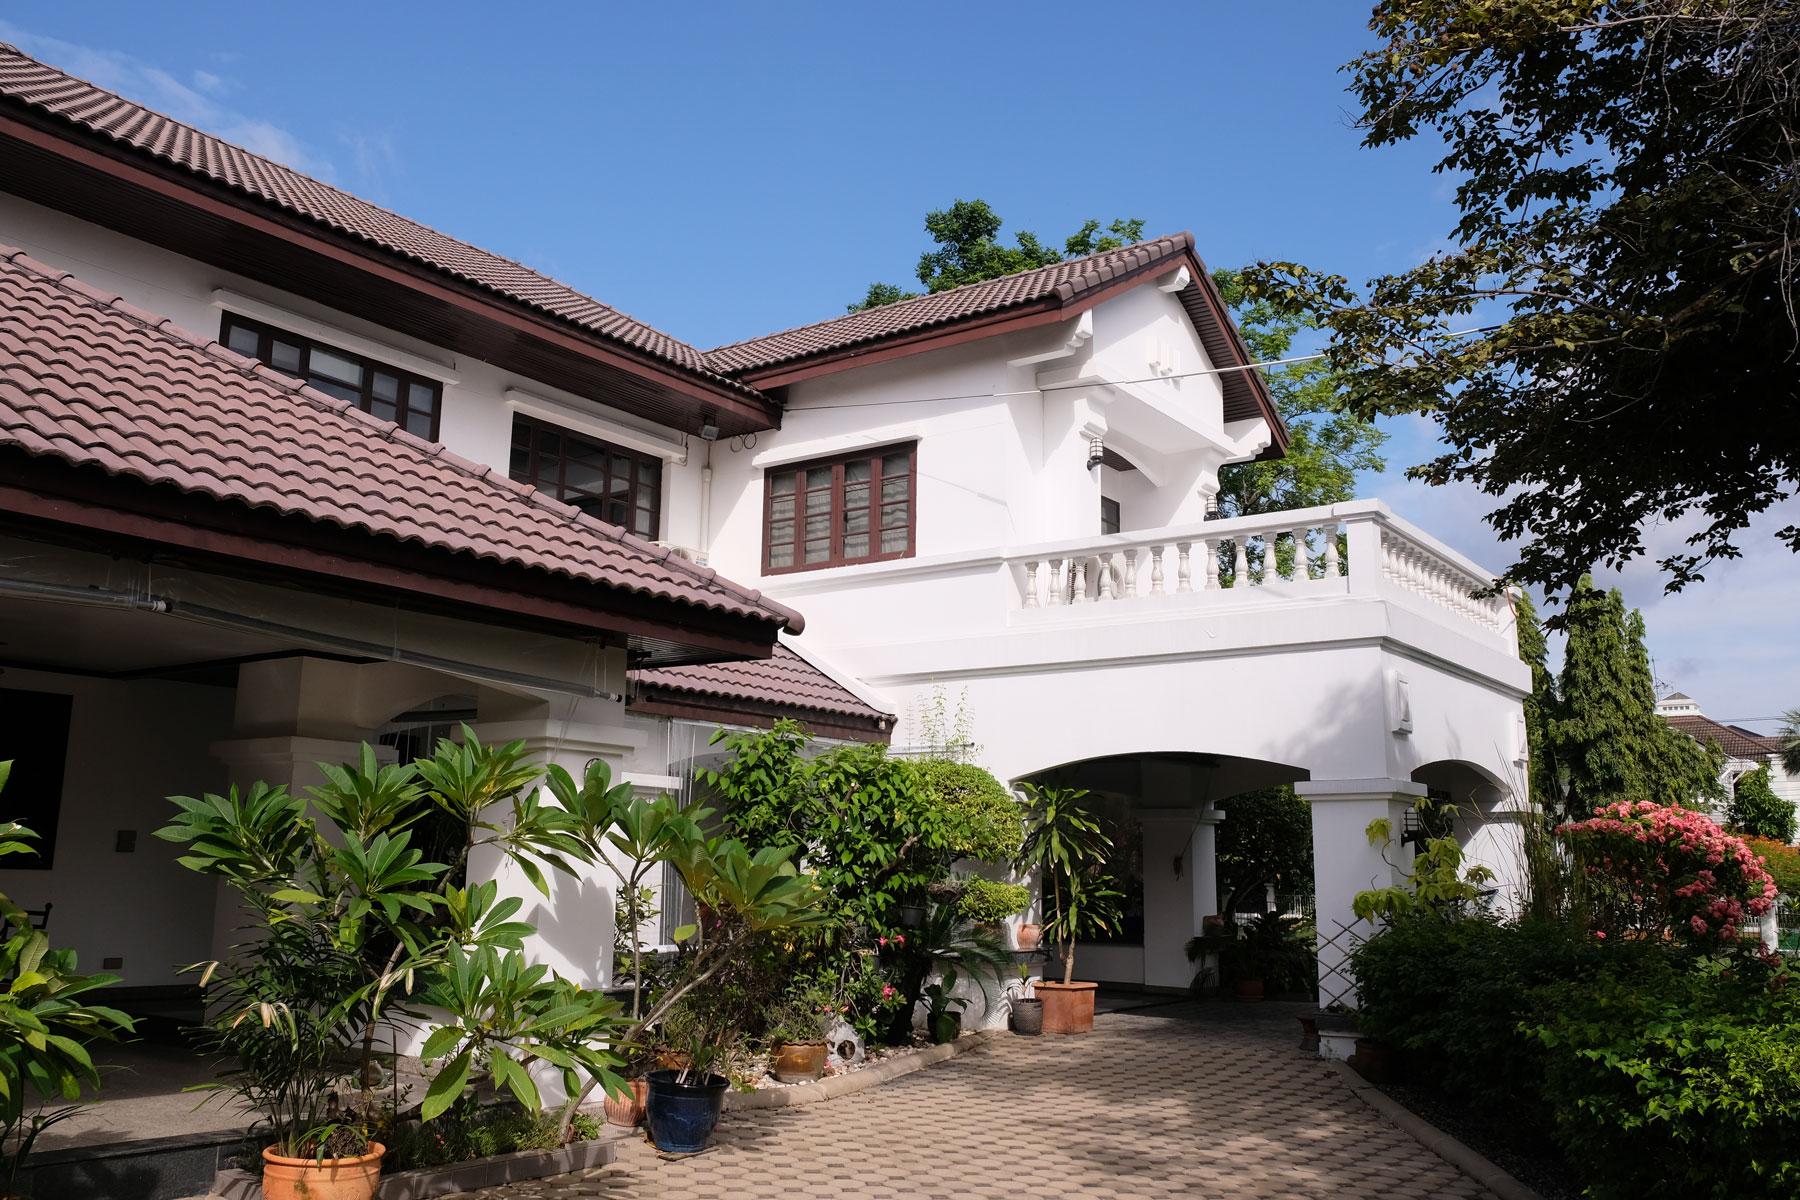 Ein großes Haus in Bangkok.